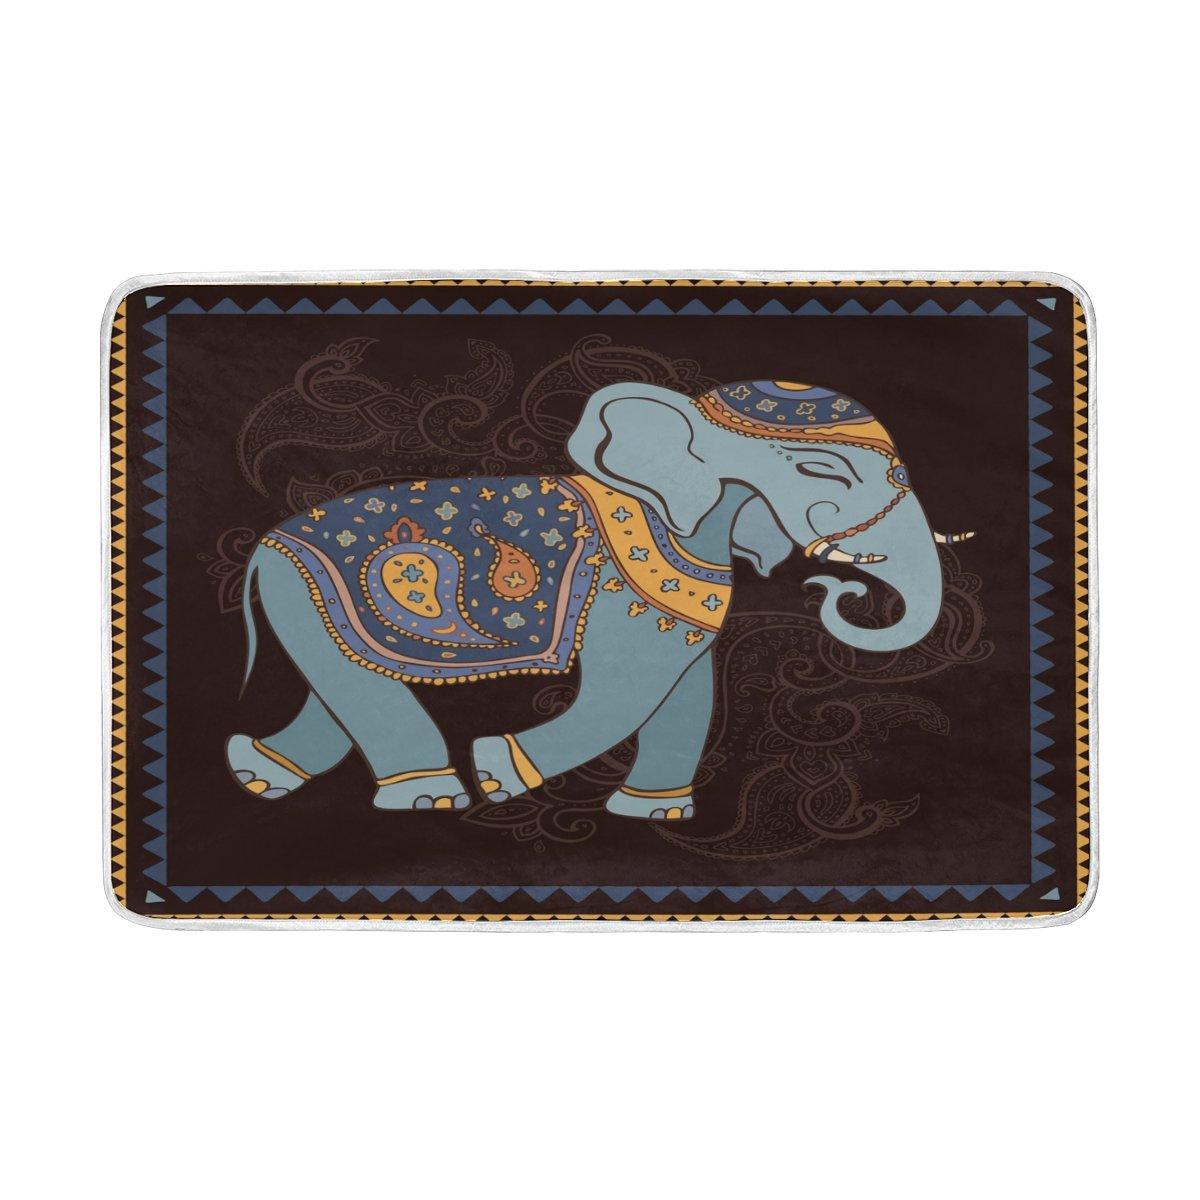 ALAZA Elephant Stylish Blanket Animal Luxury Throw Personalized Stylish Fuzzy Soft Warm Lightweight Blanket for Bed Counch All Season Unisex Adult Men Women Boys Girls 60x90 inches